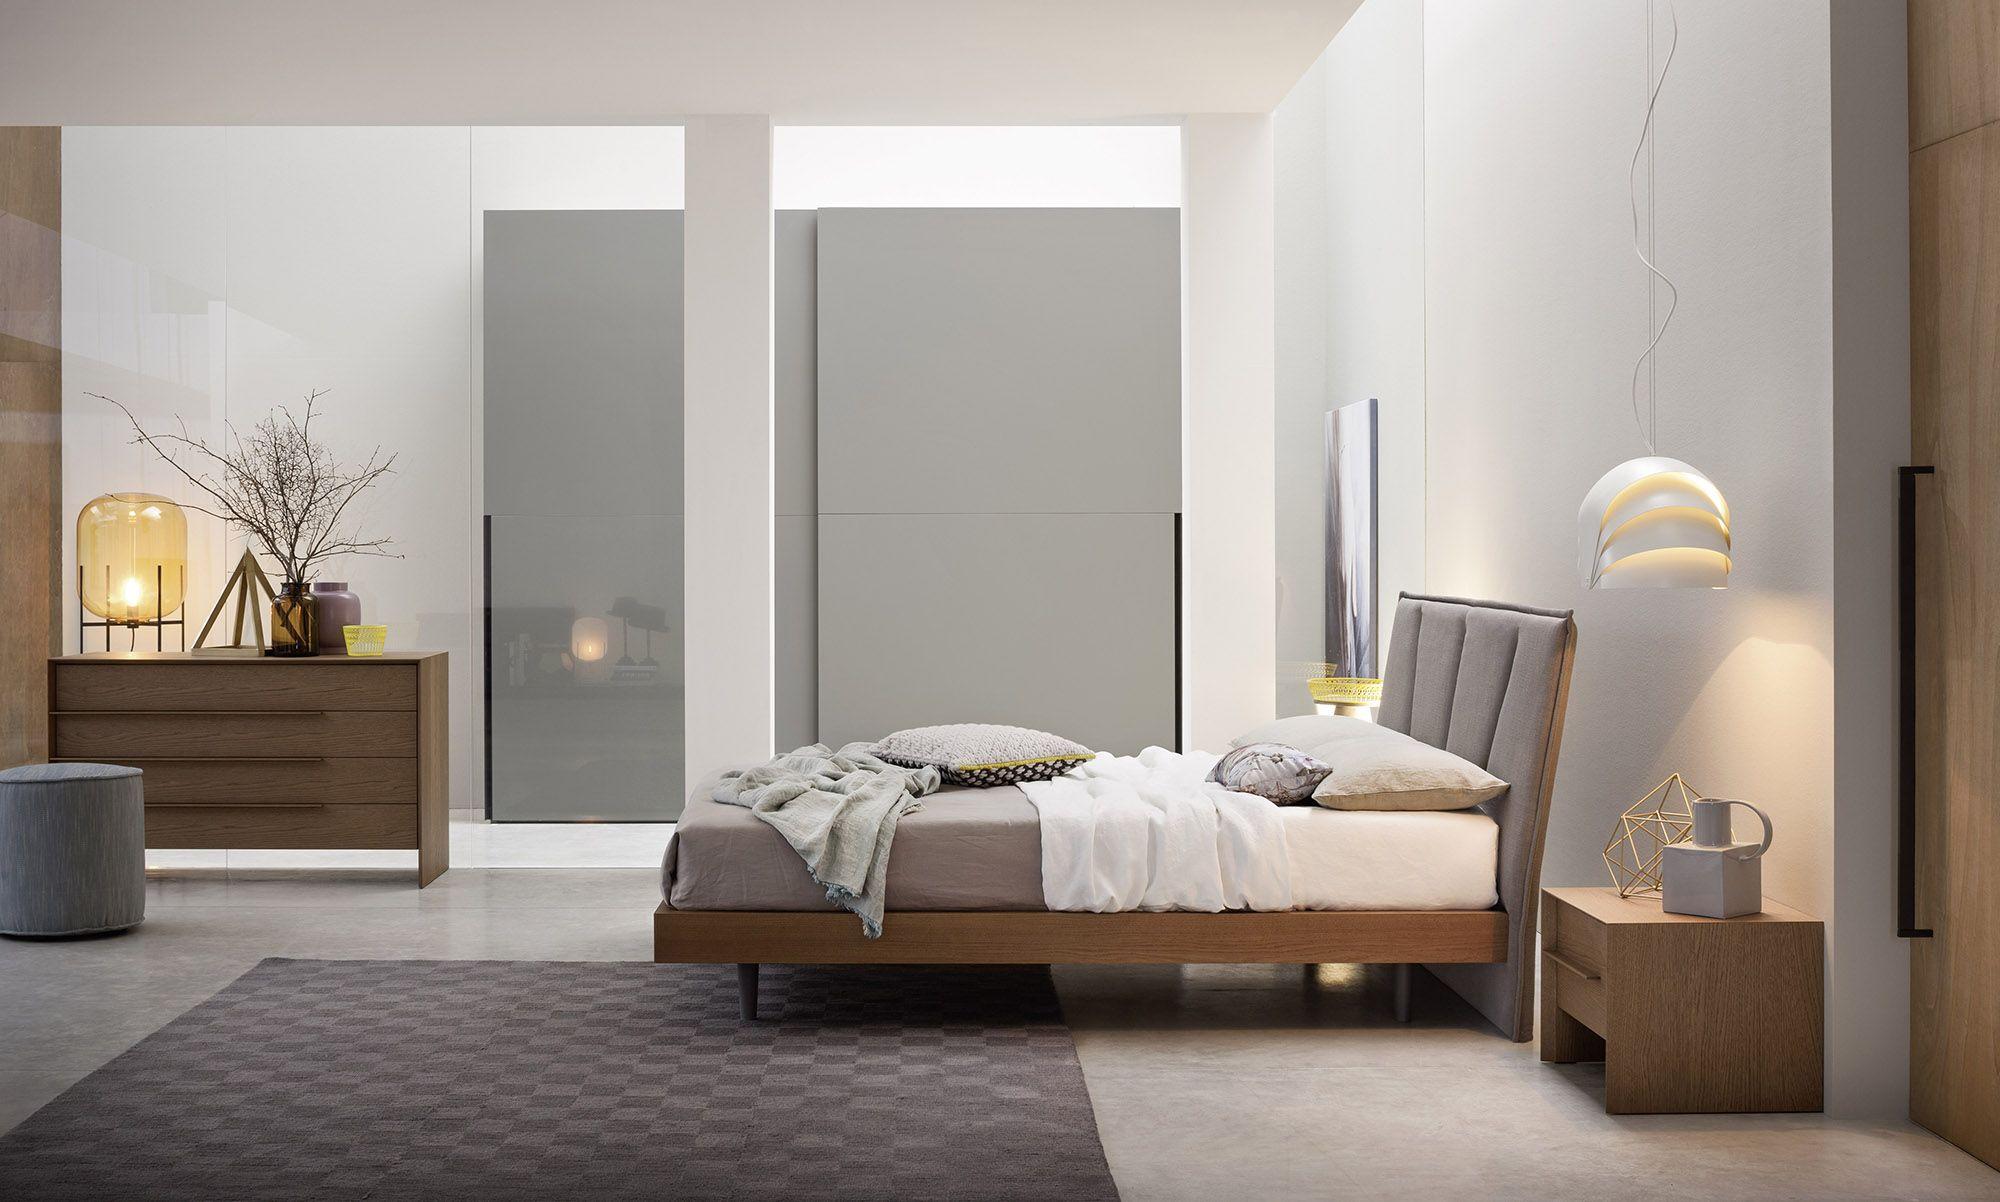 Bett Freistehend betten bedrooms